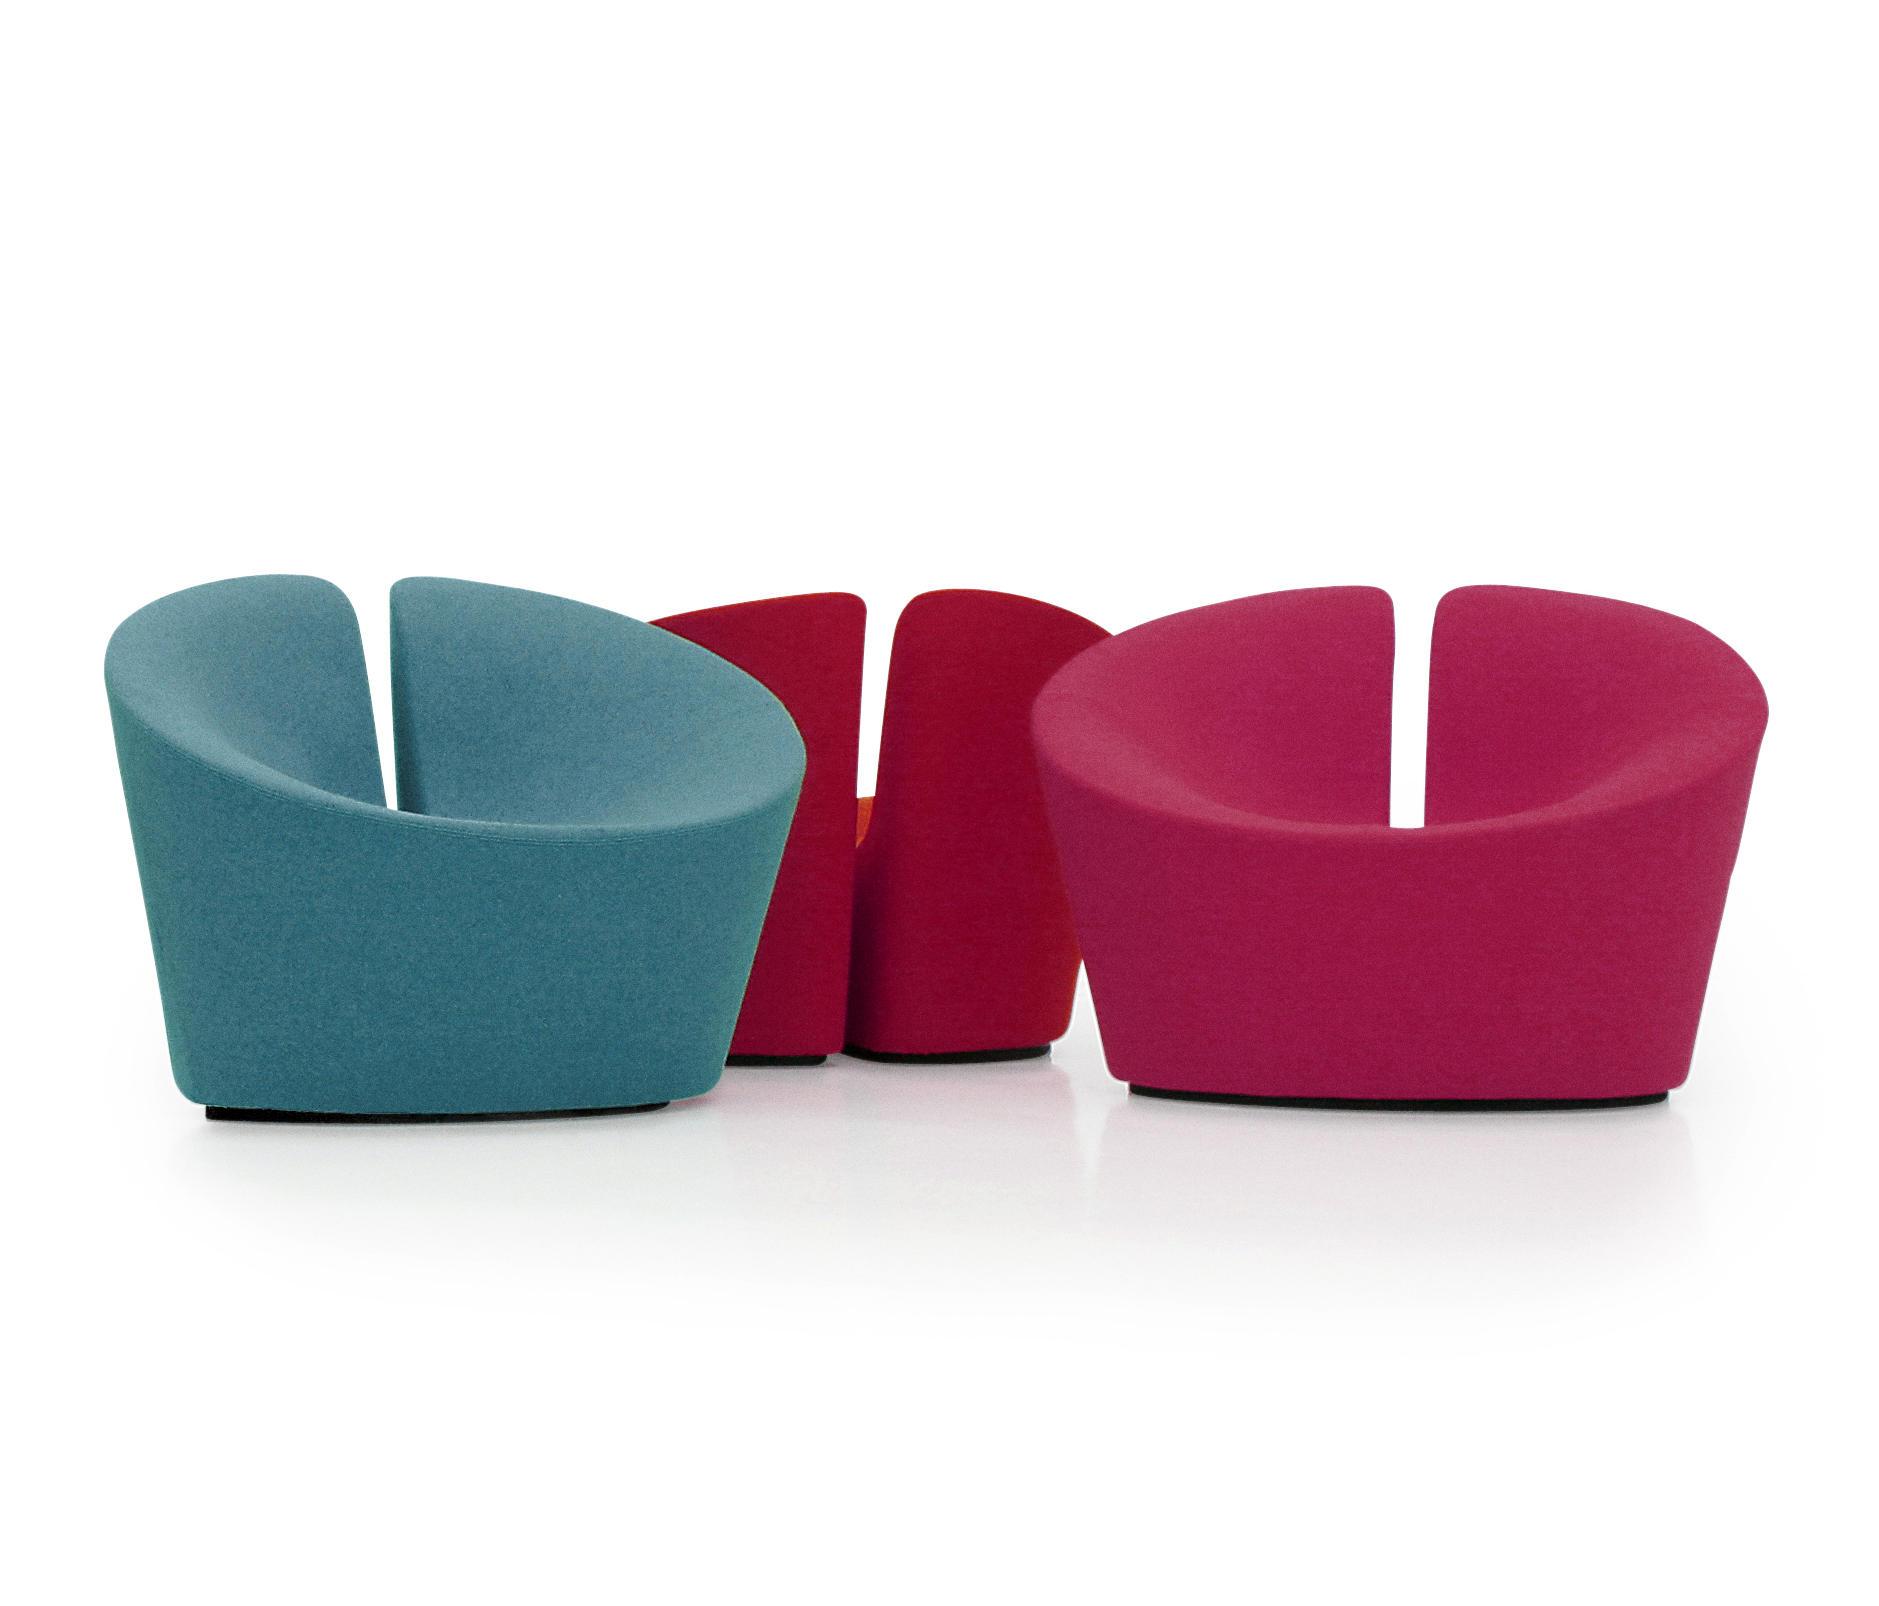 Genial ... True Love Chair By +Halle ...